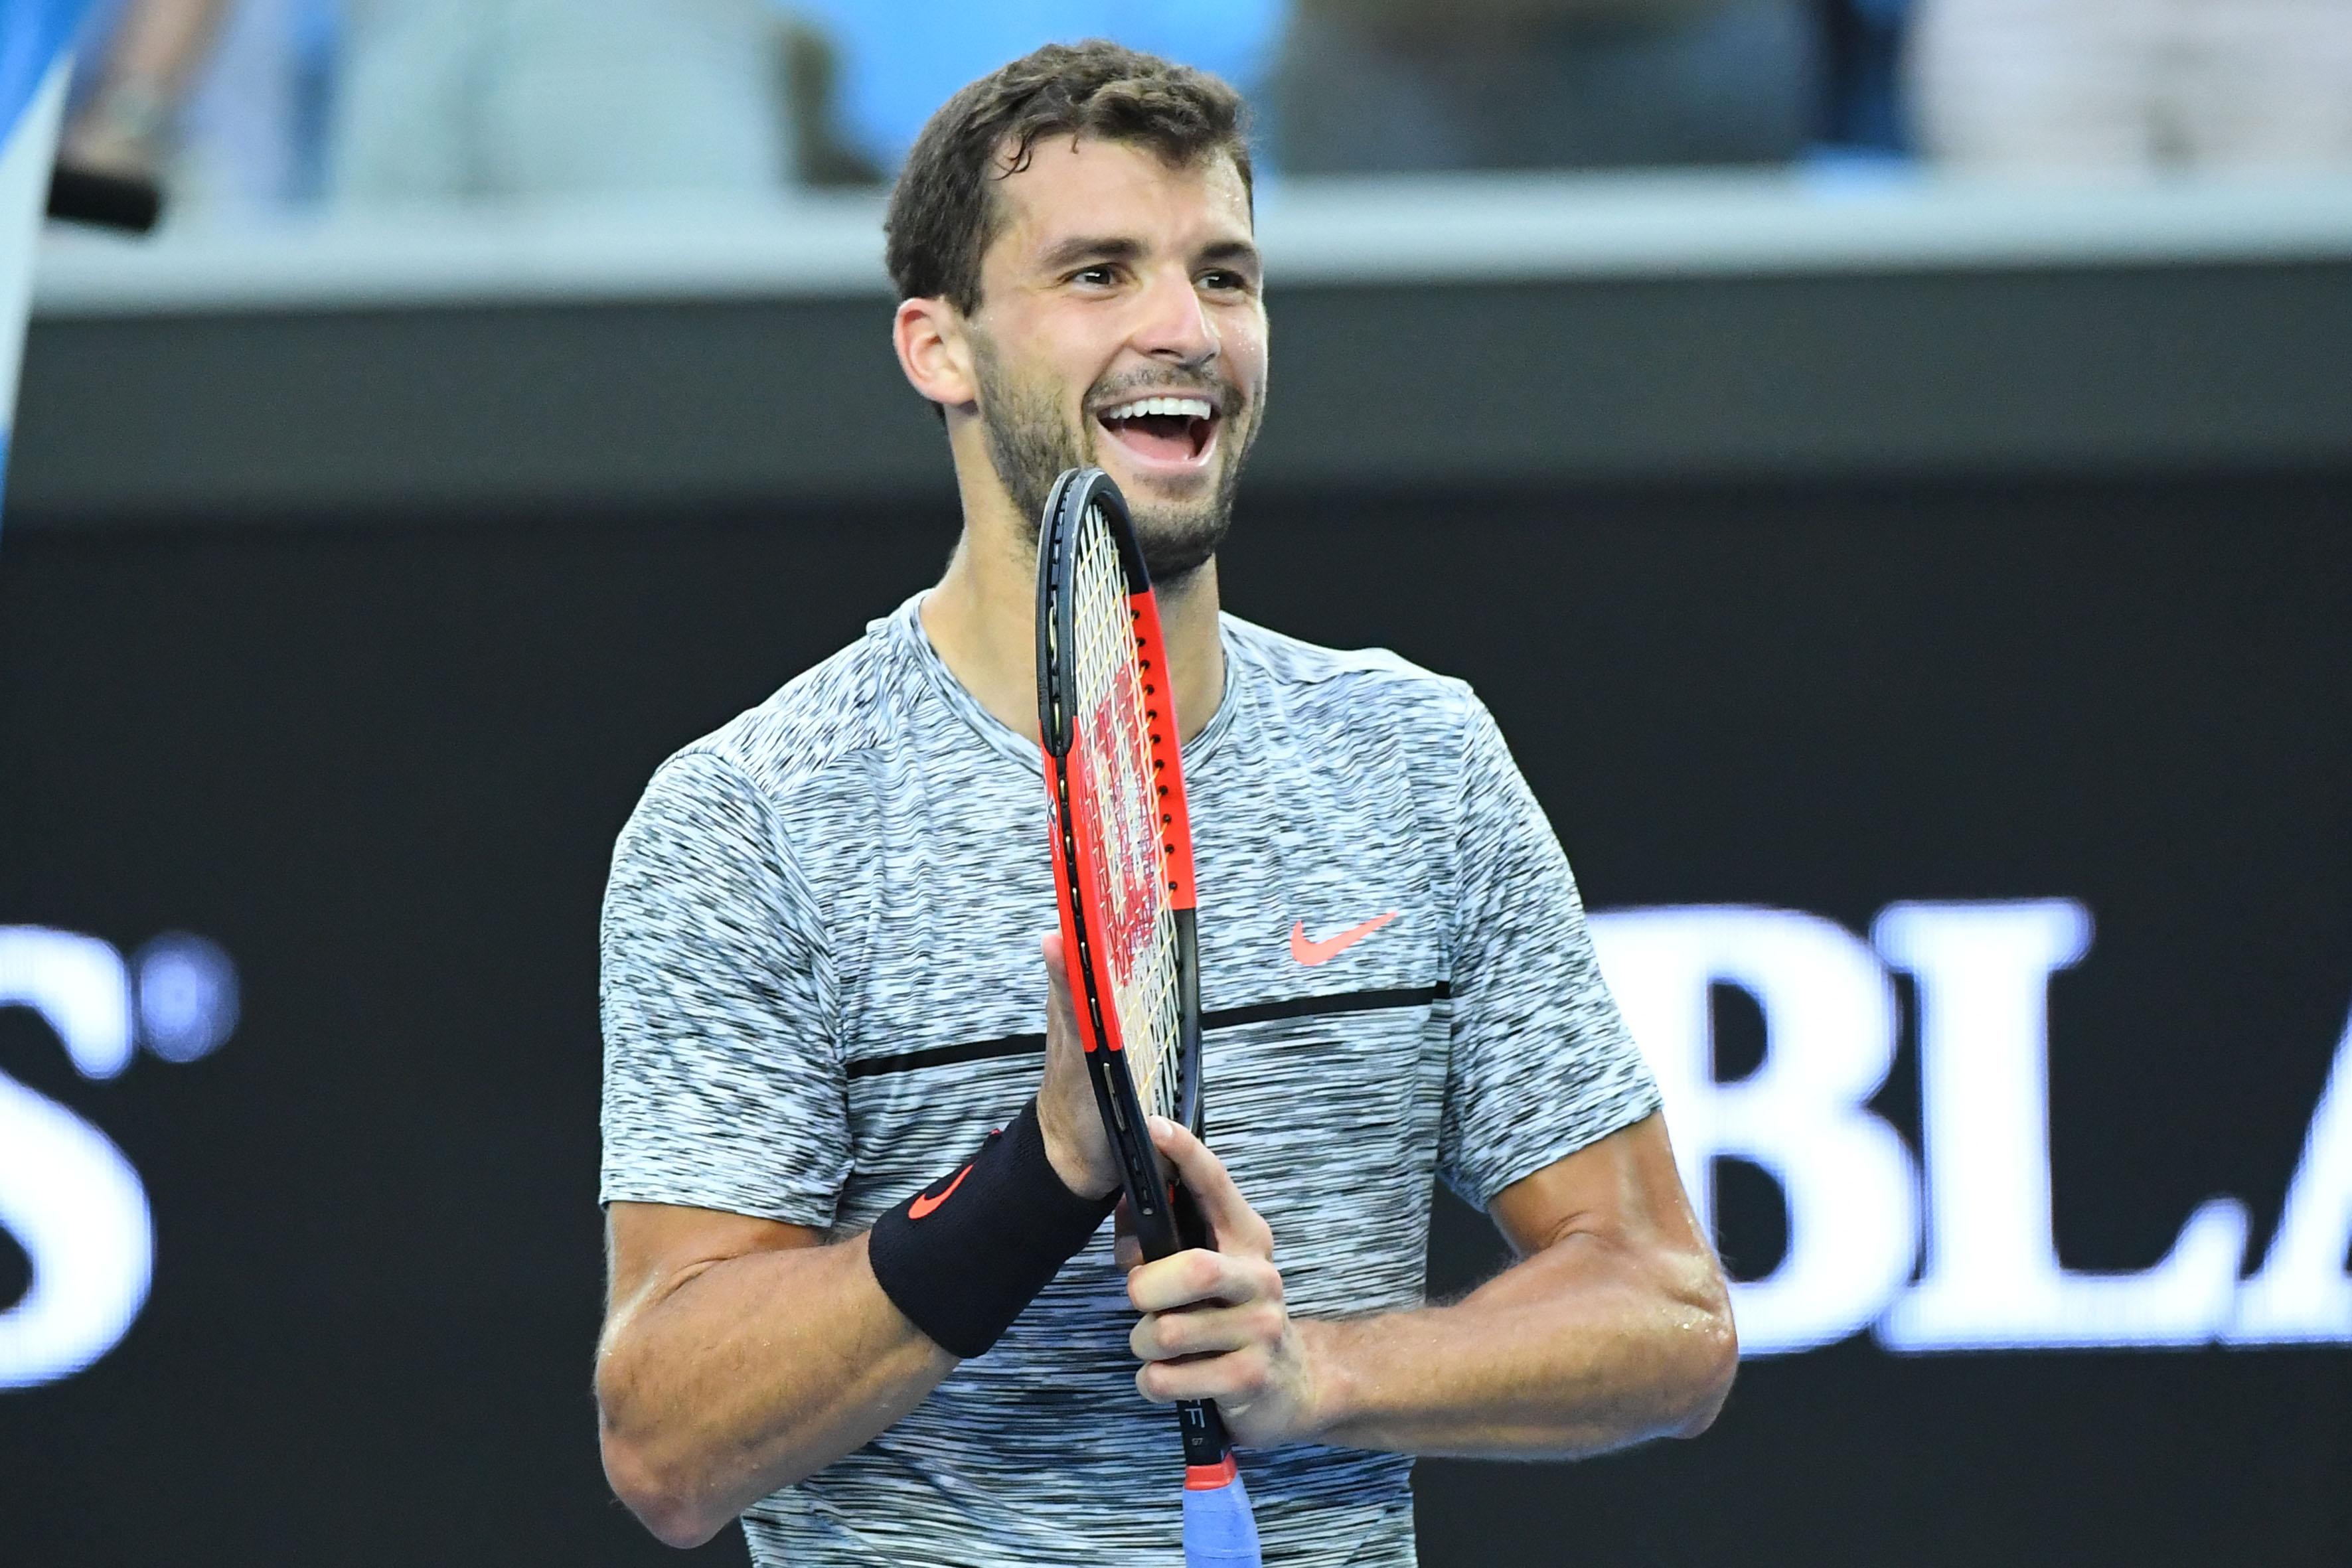 Tennis : Open Australie - Baby Federer, Nicole Scherzinger : 5 choses à savoir sur Grigor Dimitrov